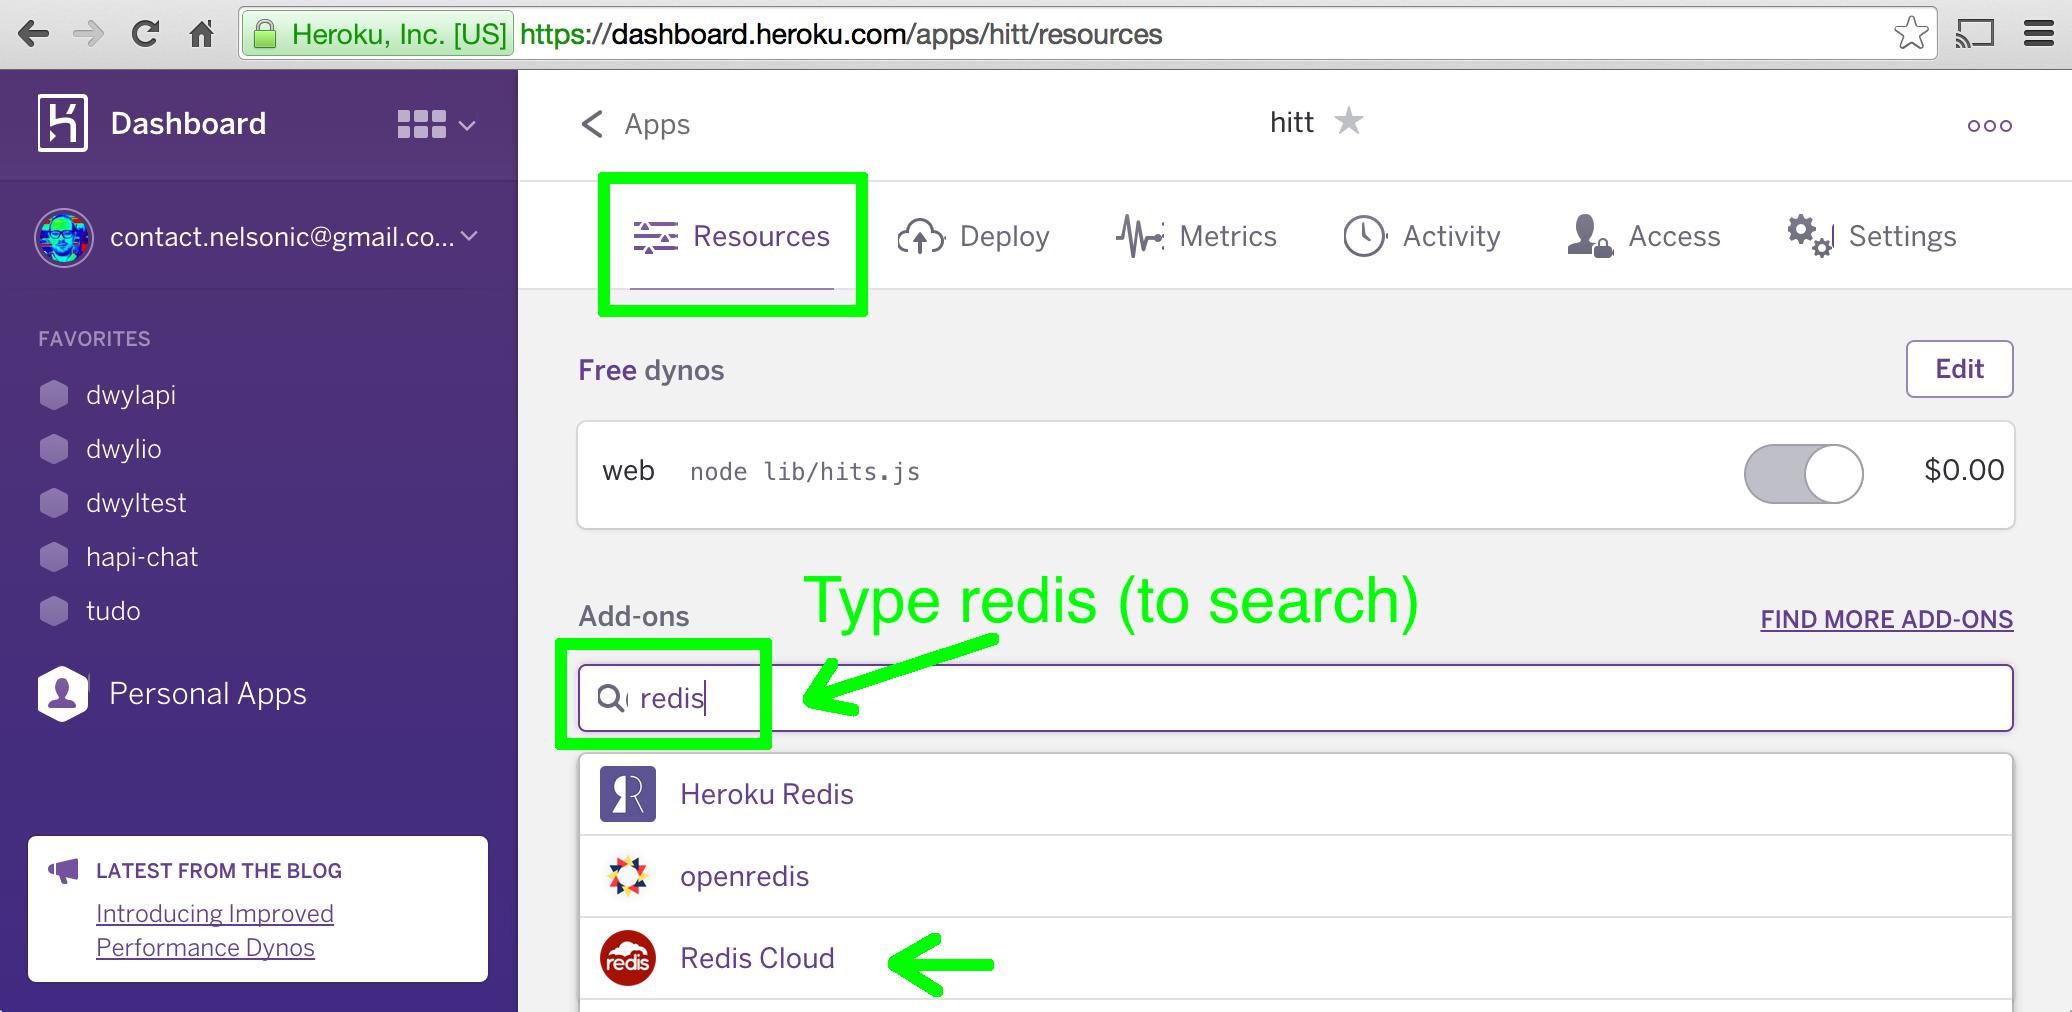 learn-redis-01-find-addon